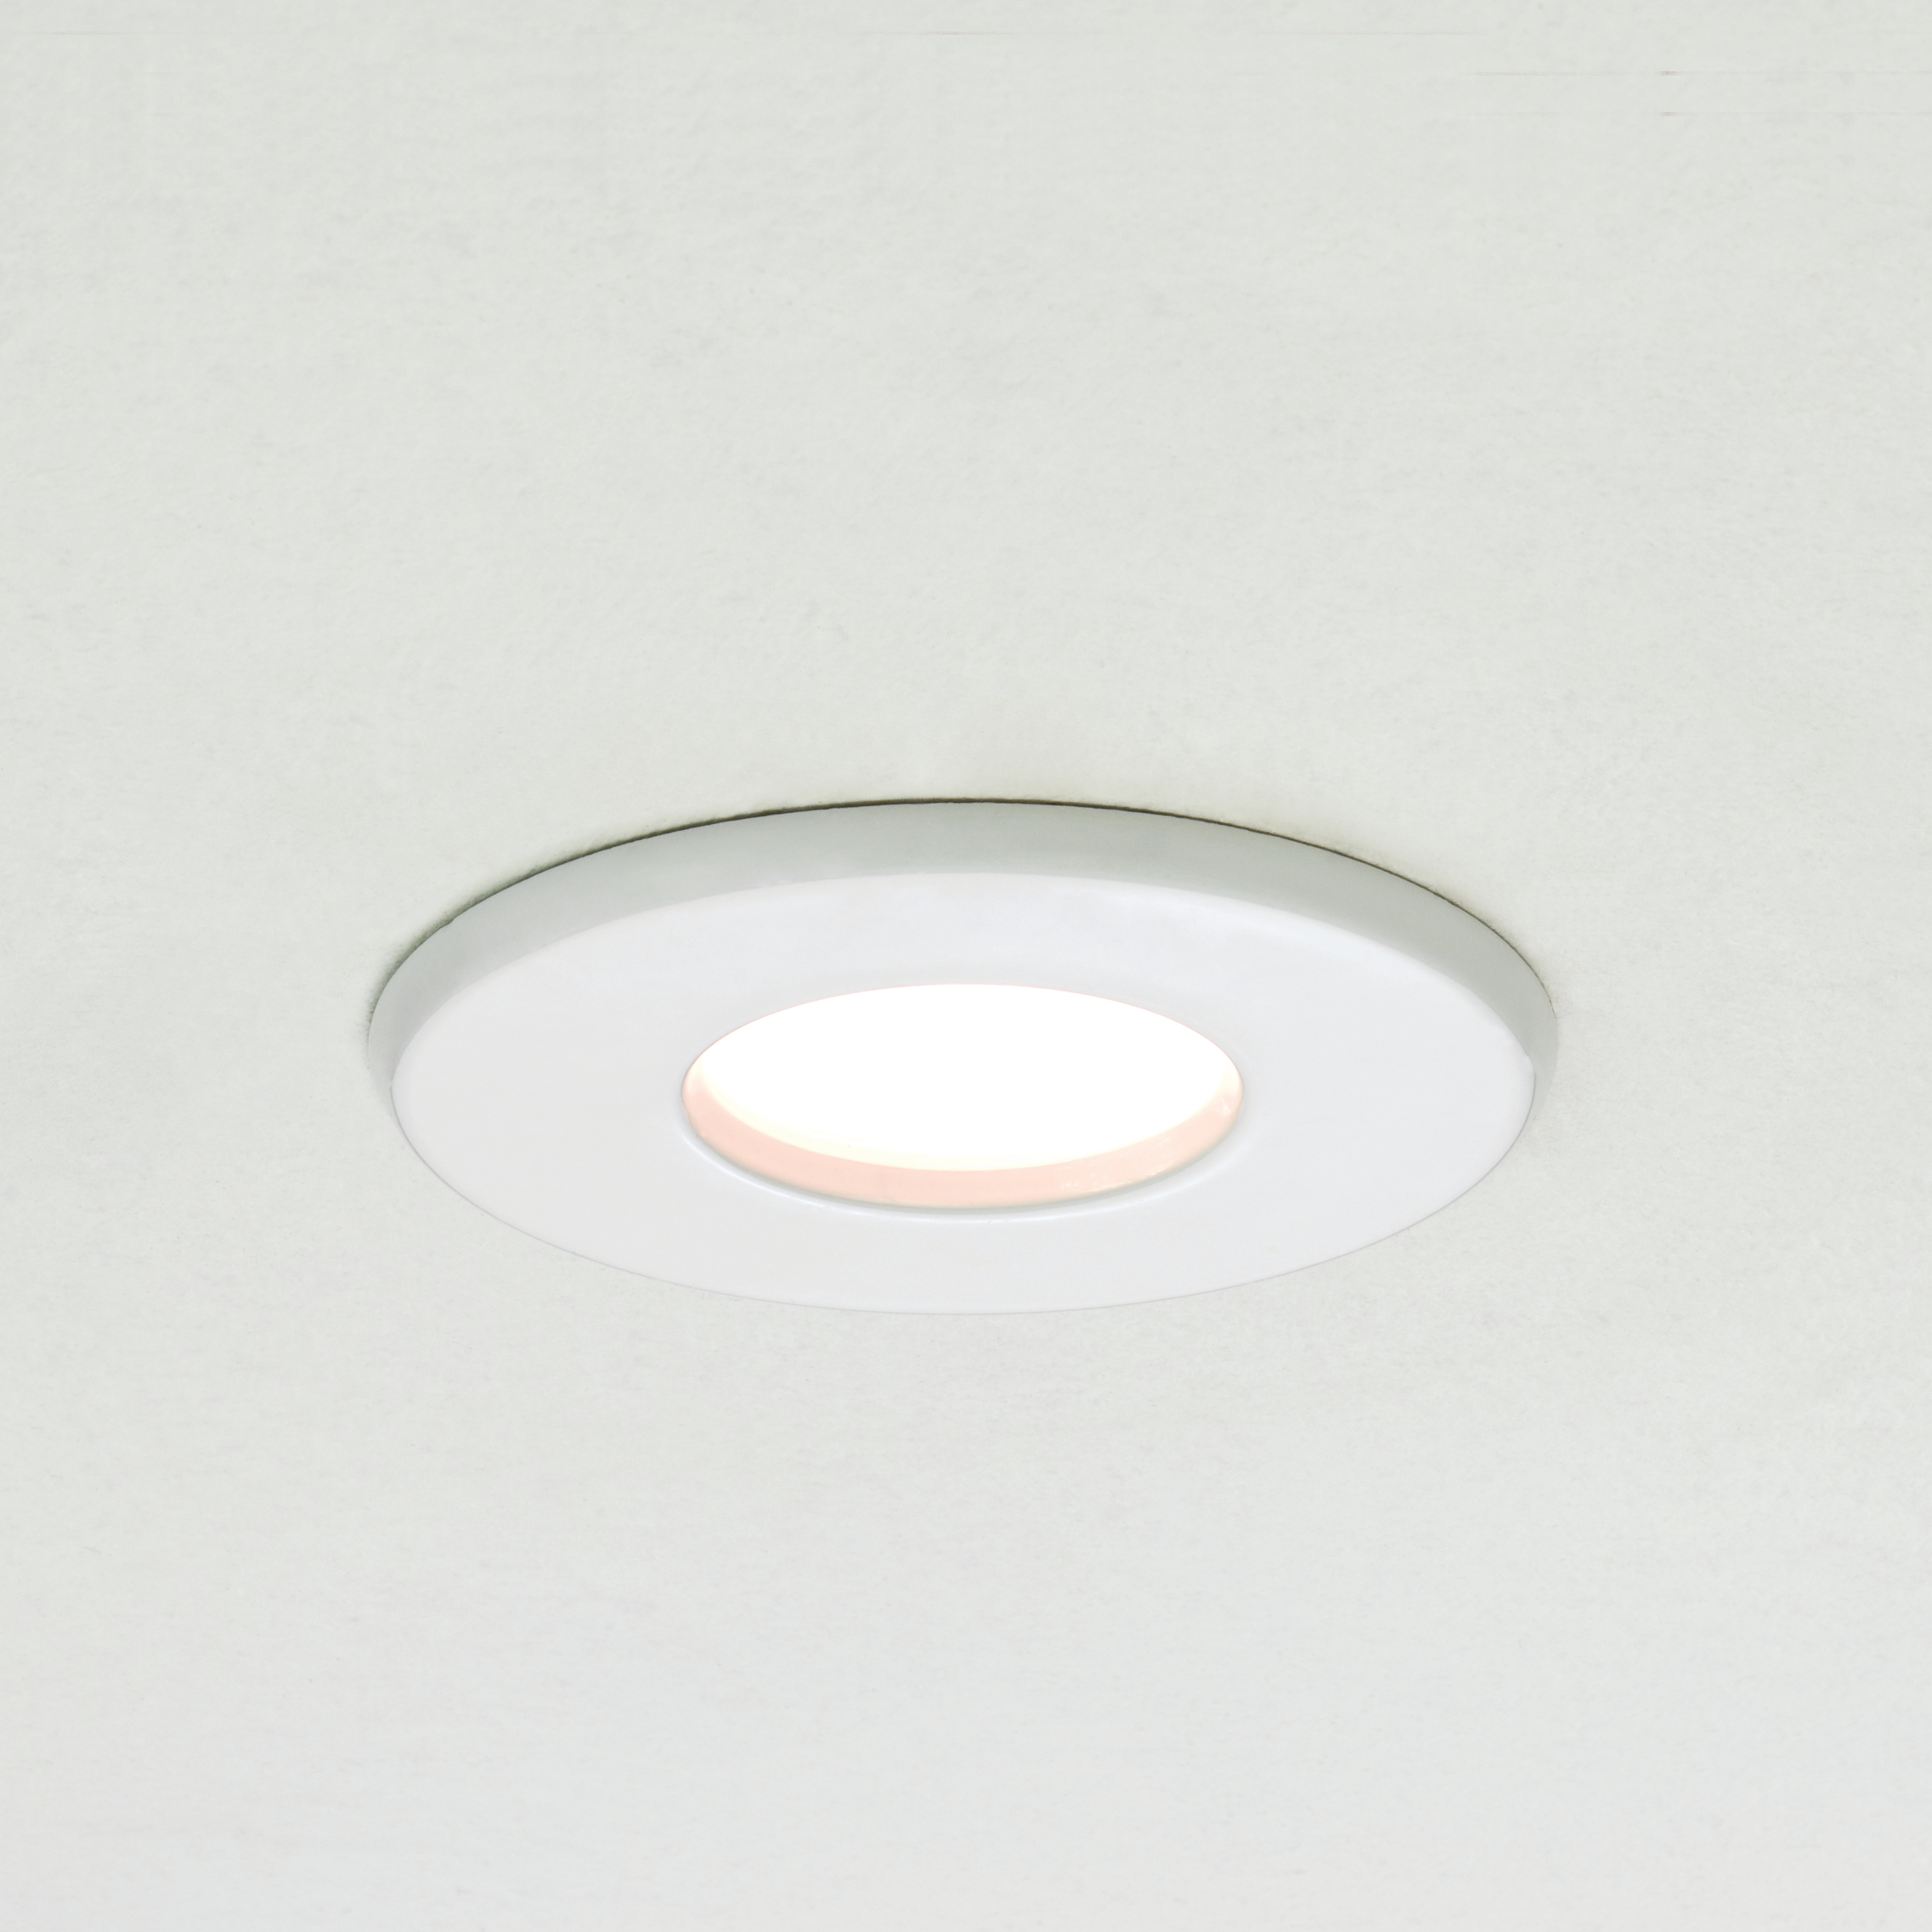 Kamo Recessed Ceiling Light